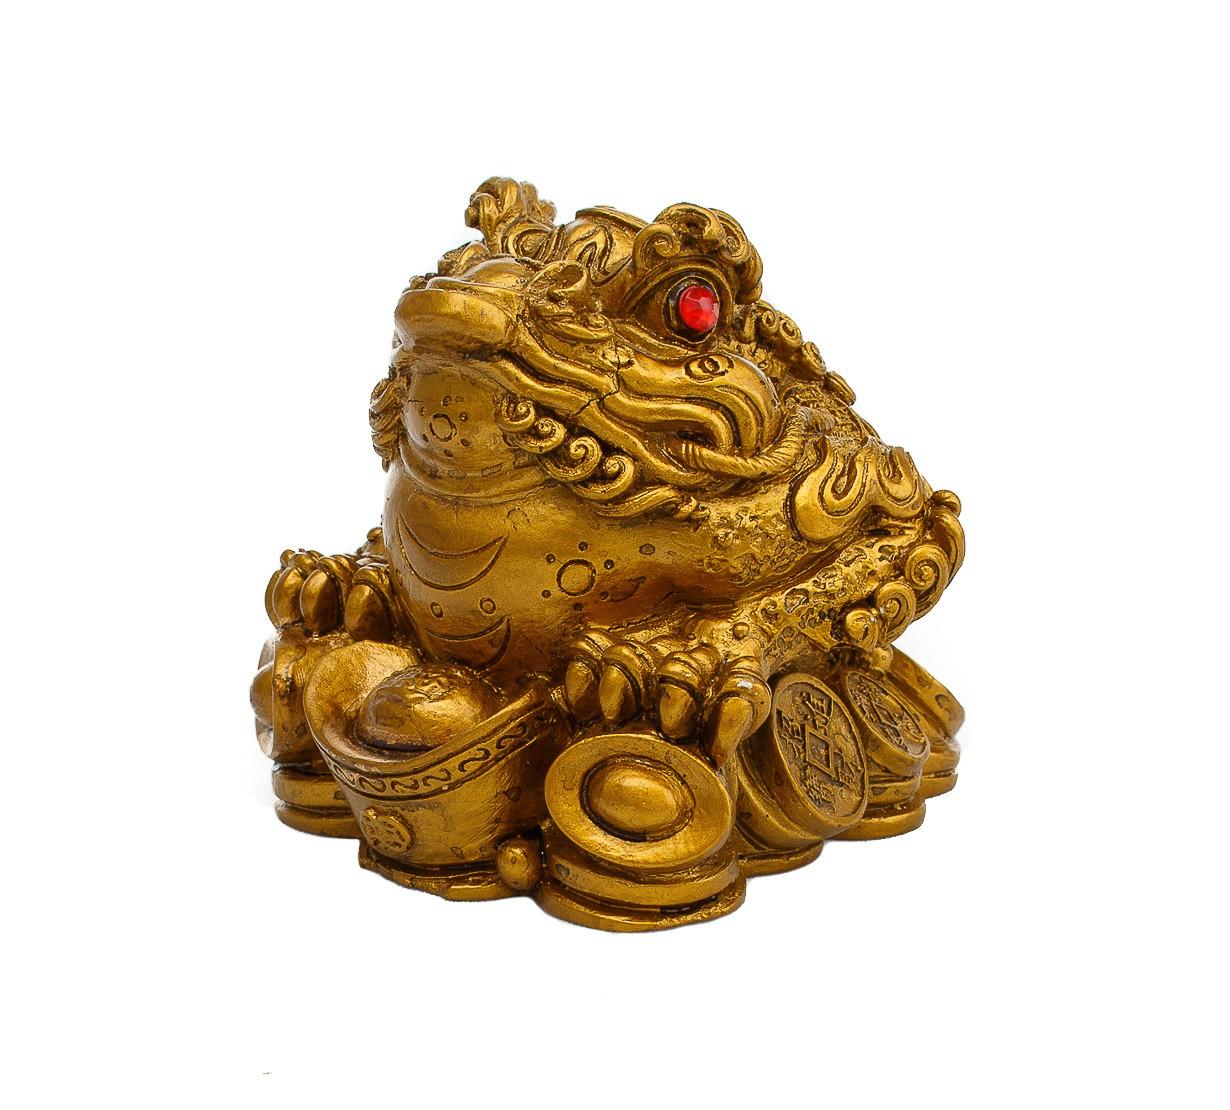 Broasca Norocoasa cu Trei Picioare pe Monede I-Ching si pepite